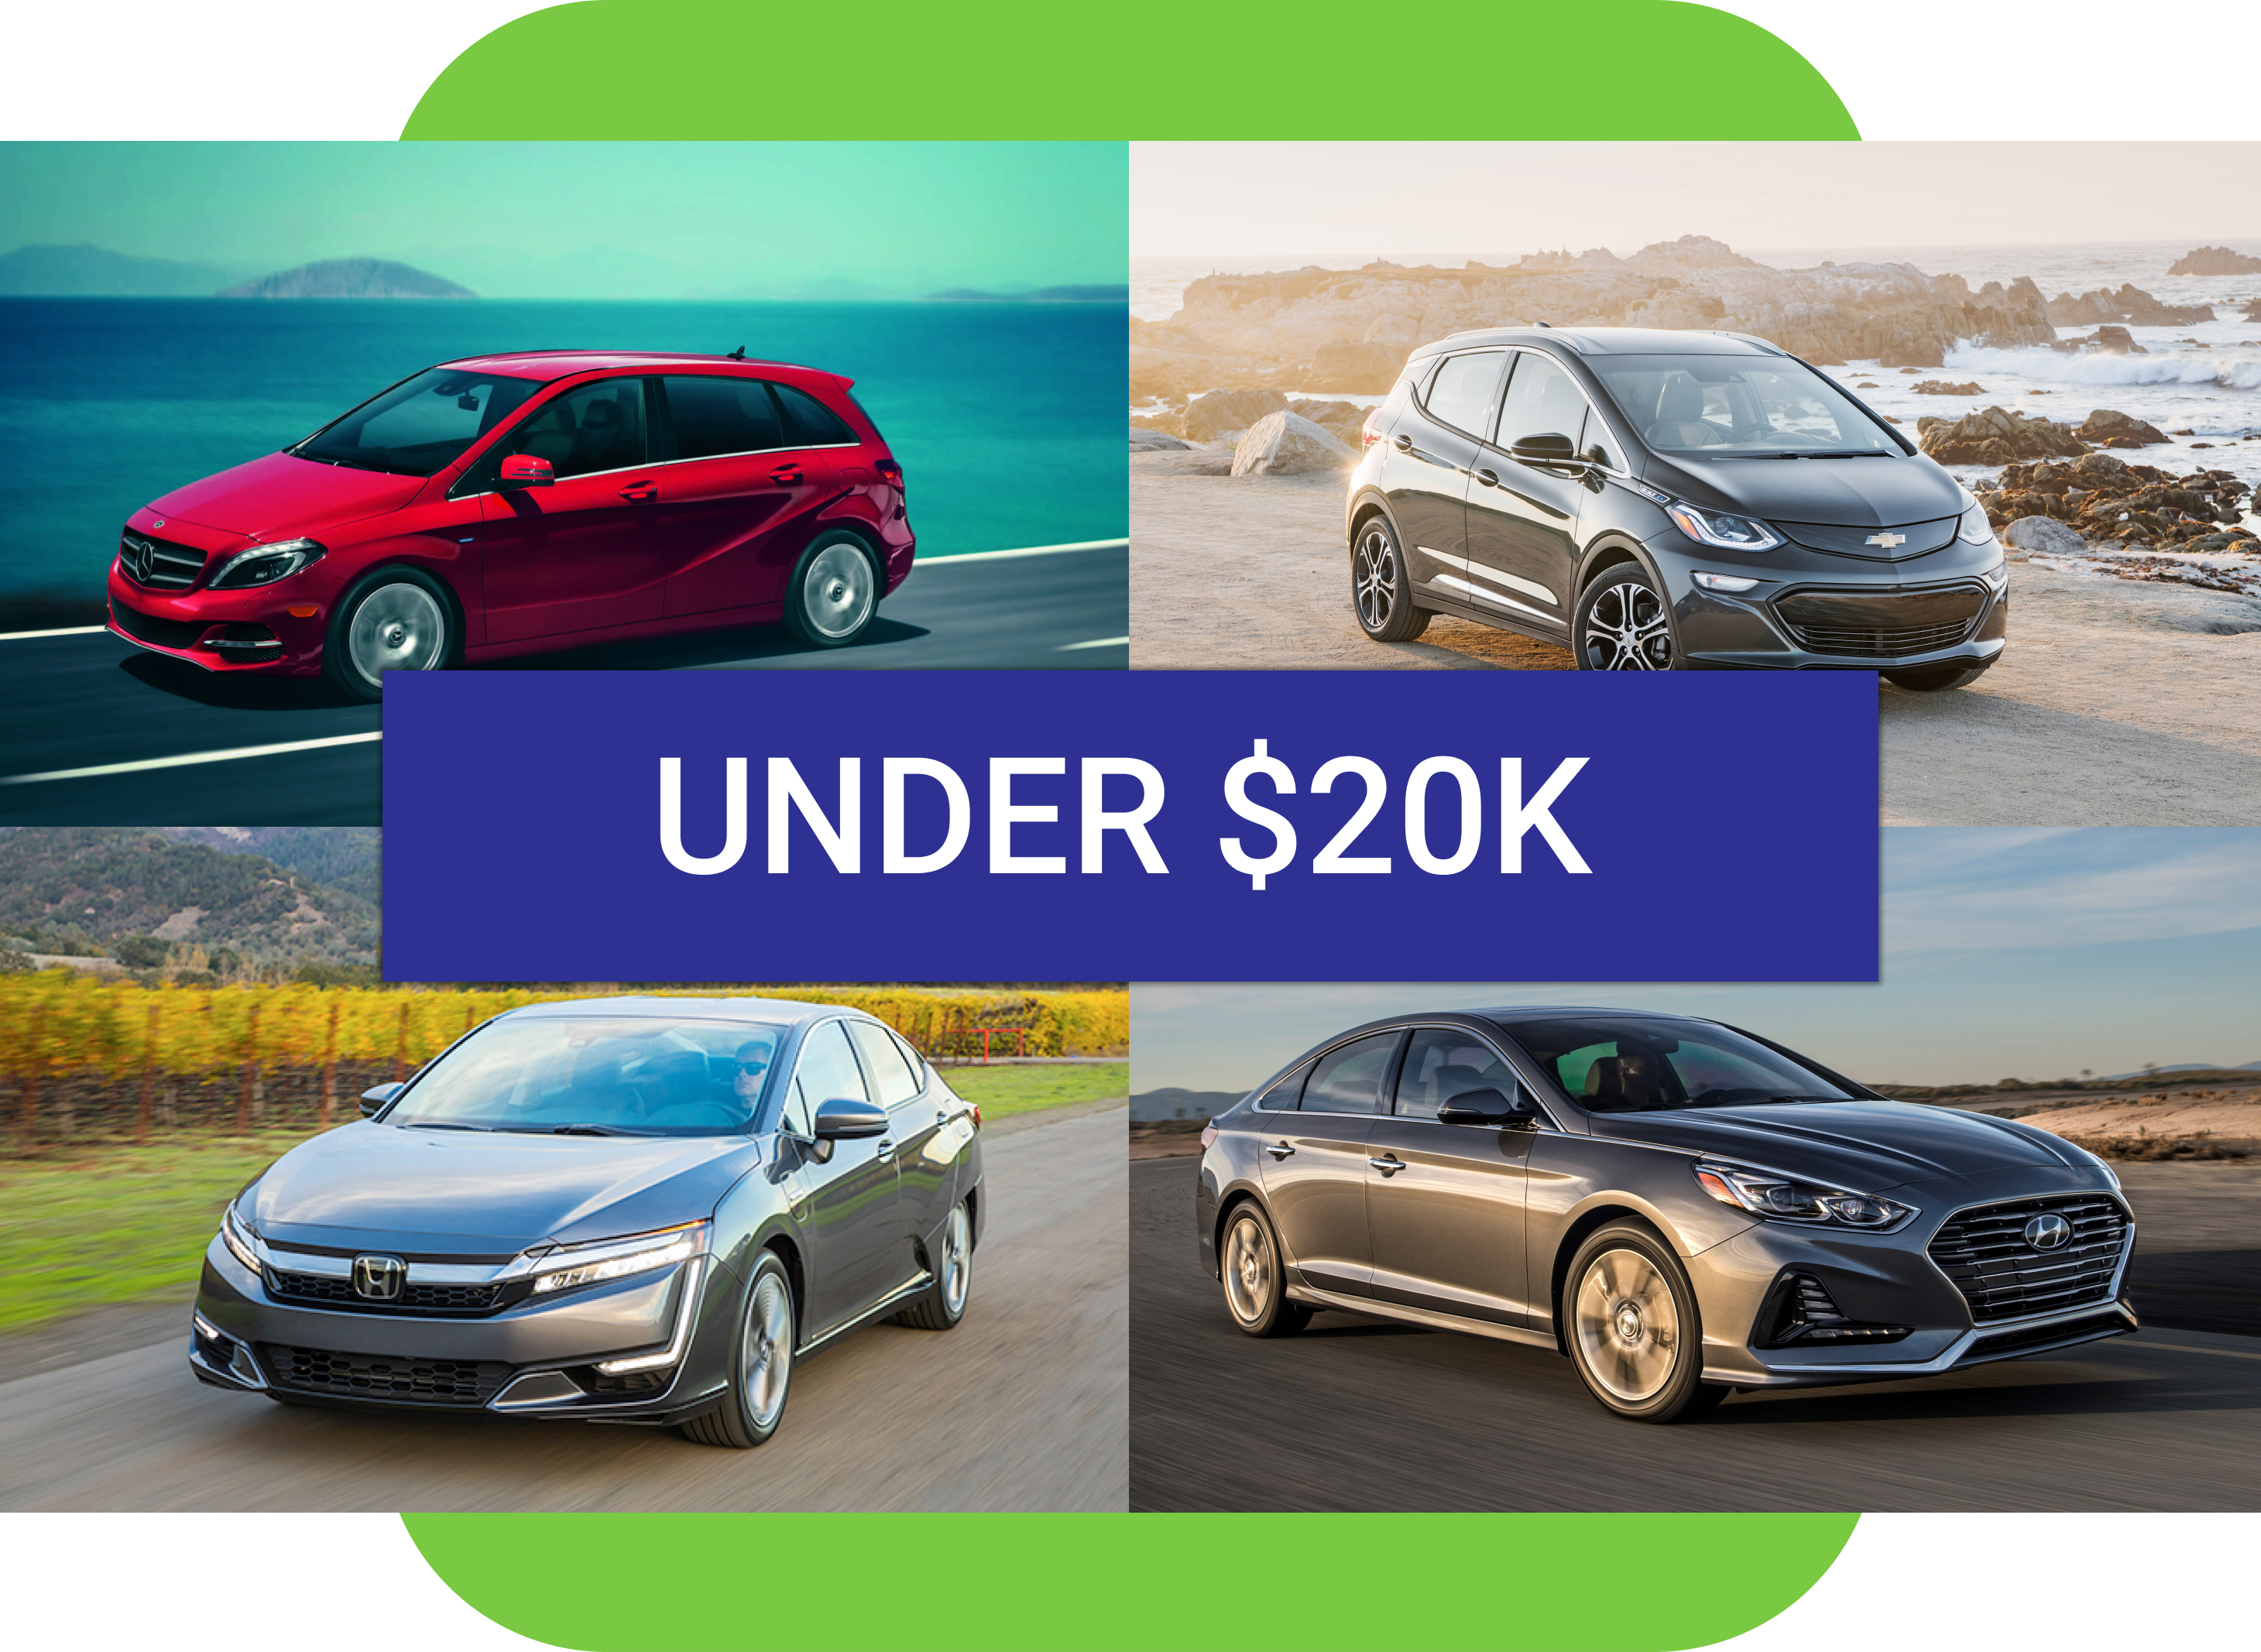 Best used EV under $20k